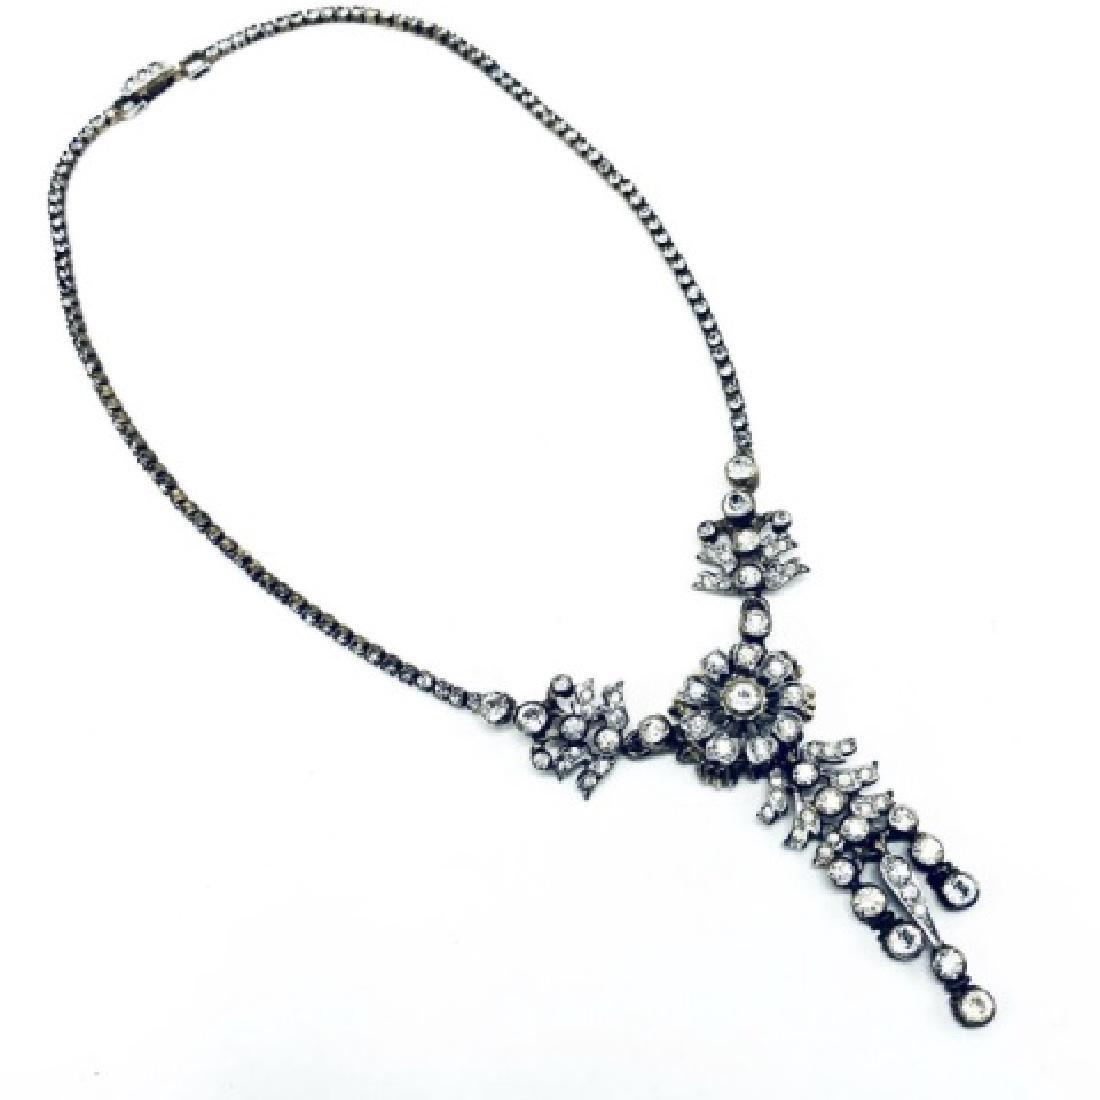 DeRosa Sterling & Rhinestone Floral Necklace